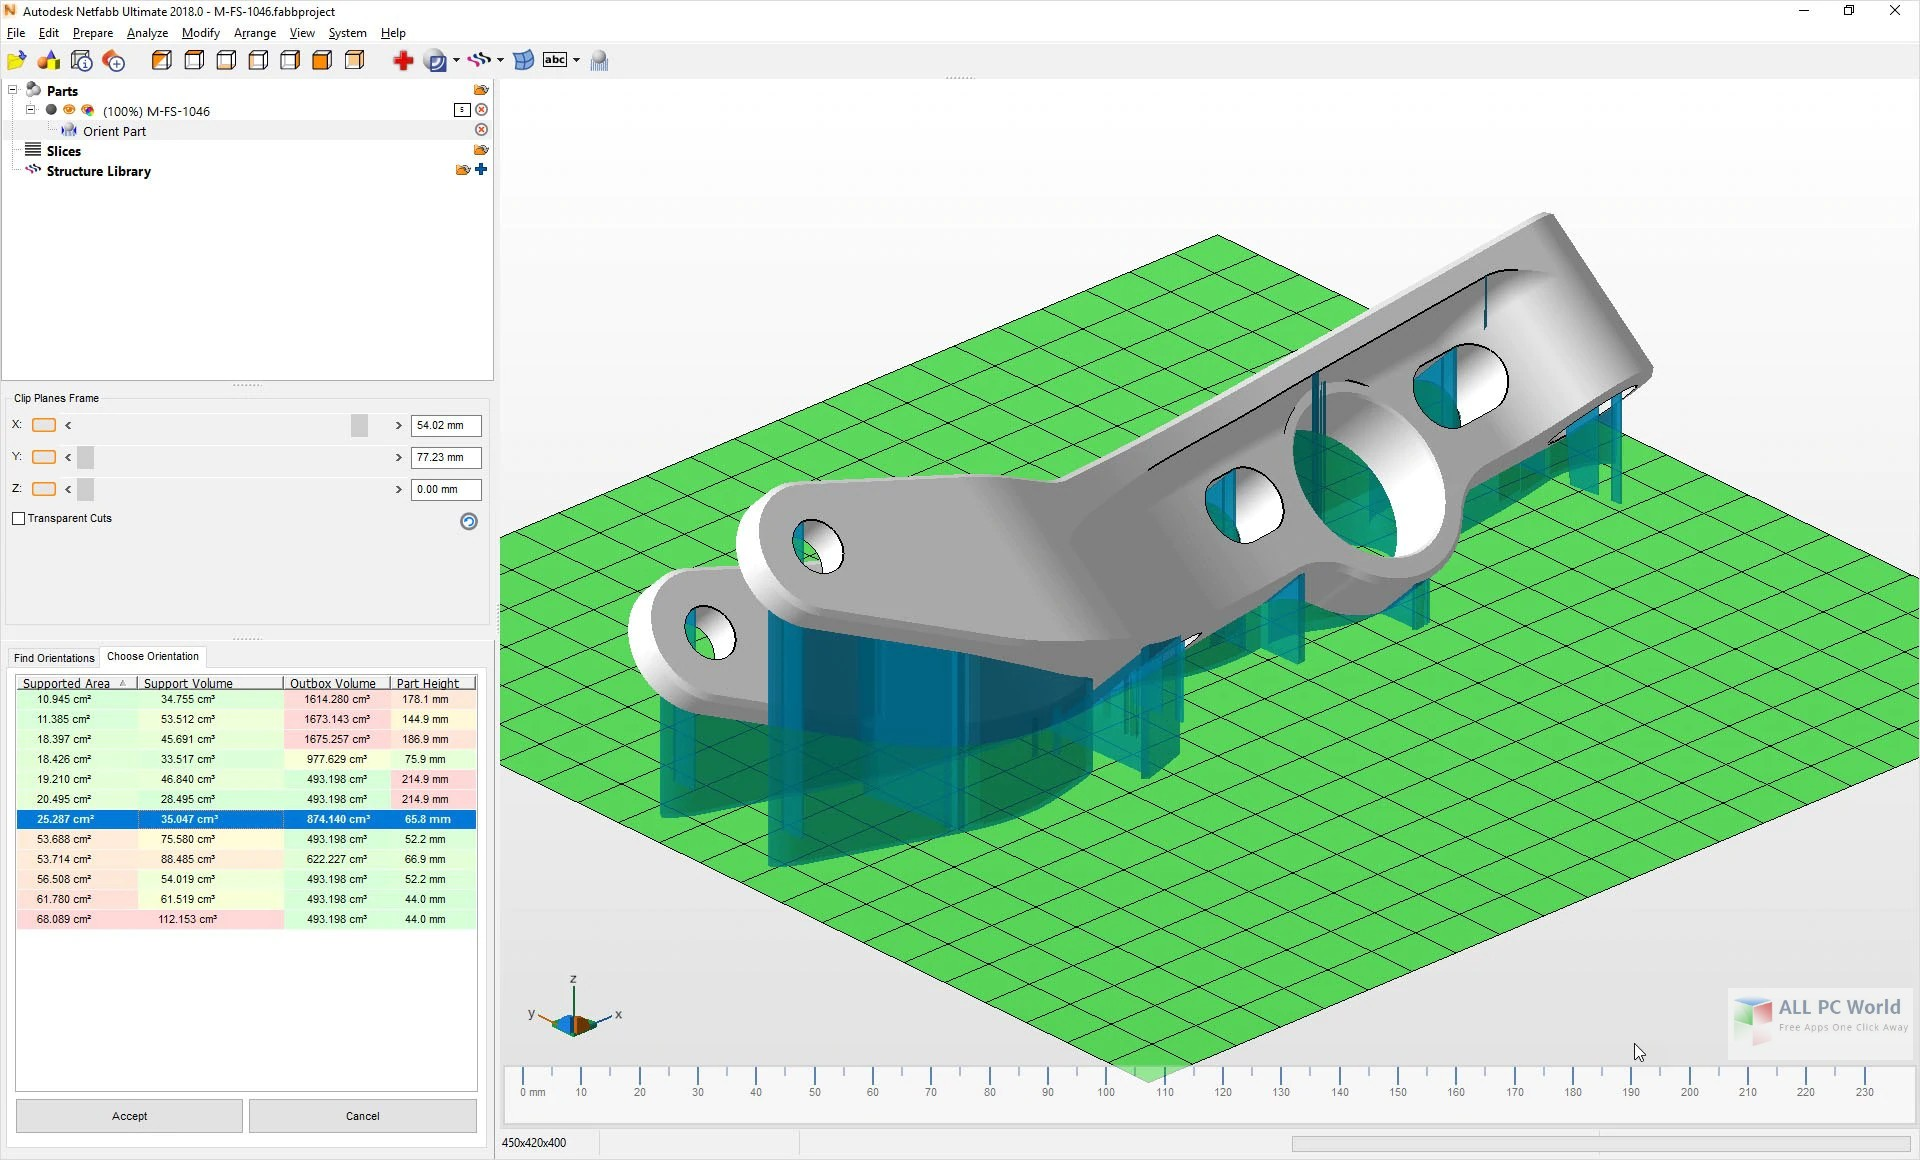 Autodesk Netfabb Premium 2019 R1 Free Download